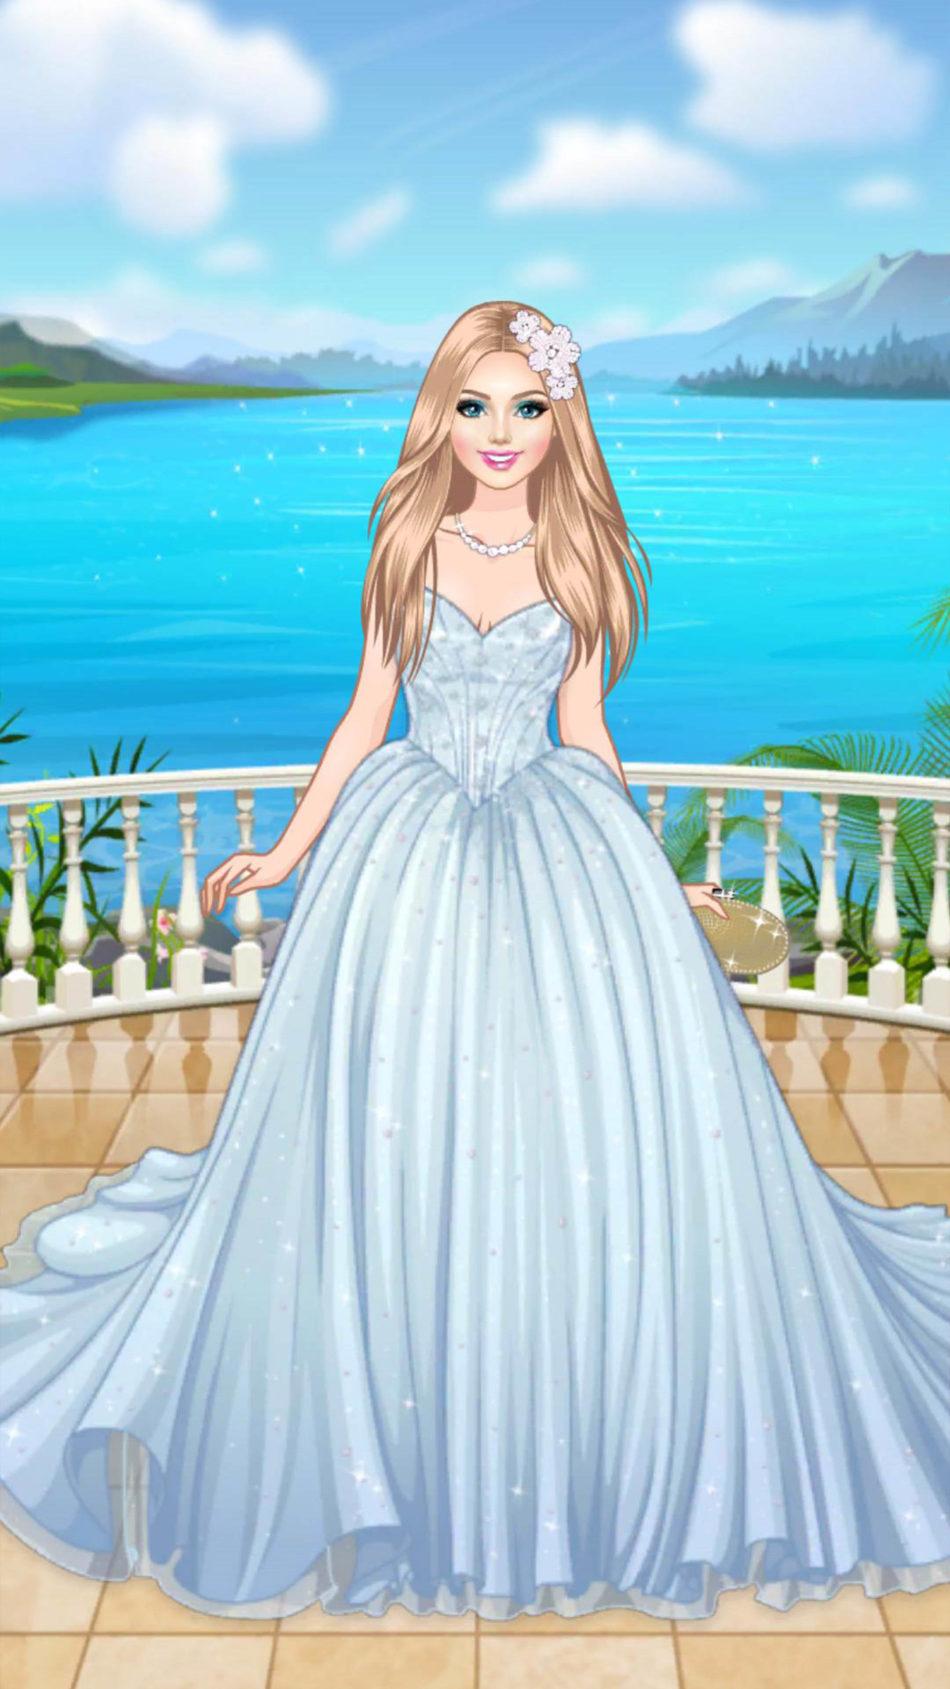 Beautiful Fairy Girl In Wedding Dress 4K Ultra HD Mobile Wallpaper